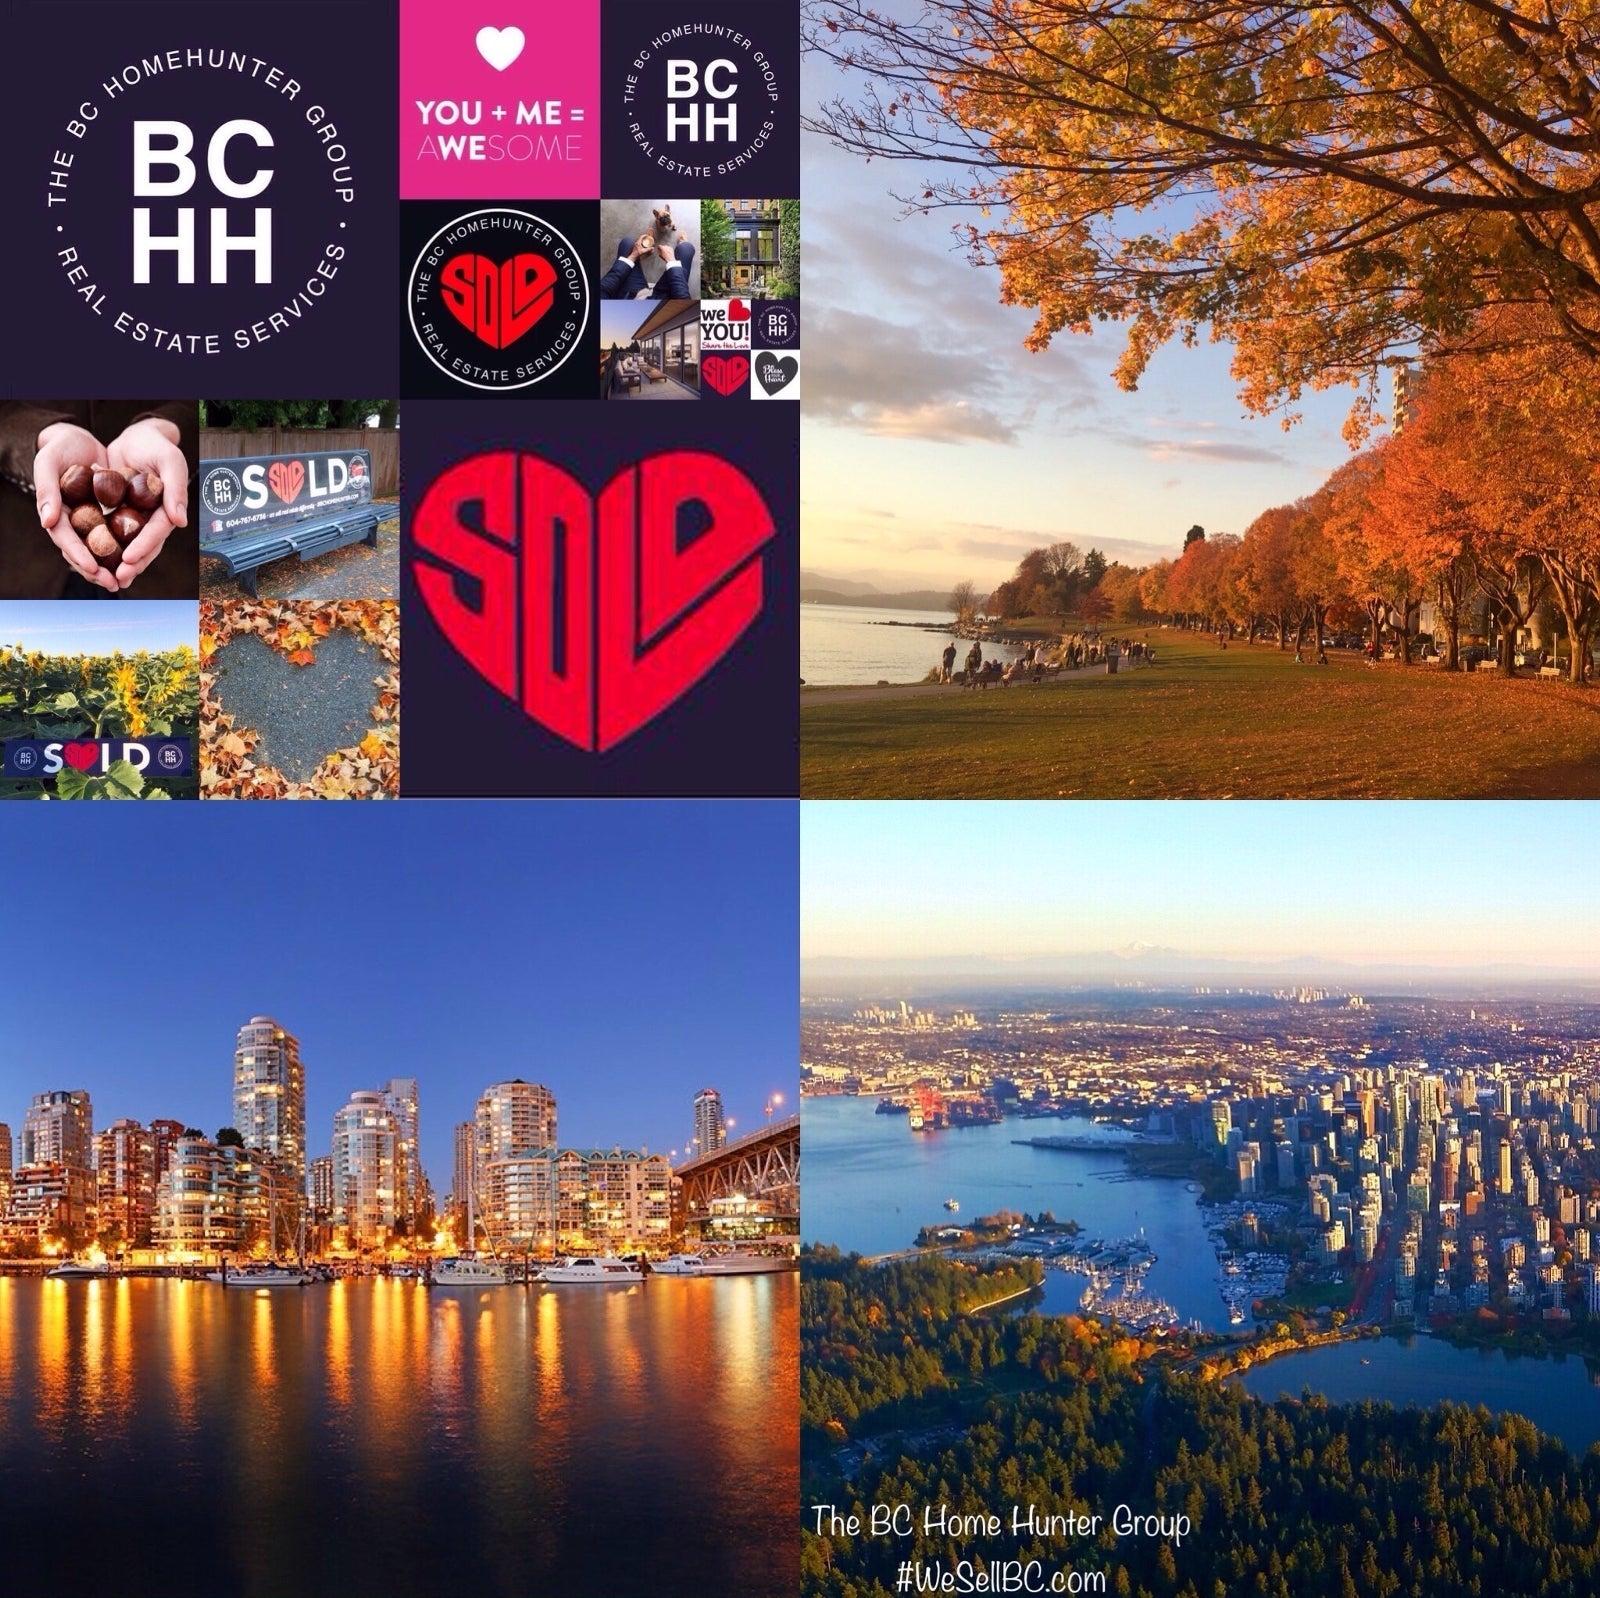 THE BC HOME HUNTER GROUP l AWARD WINNING URBAN & SUBURBAN METRO VANCOUVER l FRASER VALLEY l BC REAL ESTATE EXPERTS 604-767-6736 #BCHOMEHUNTER.COM #BCHH BCHHREALTY.COM #WESELLBC.COM #WELOVEBC.COM #Vancouver #WhiteRock #WestVancouver   #NorthVancouver #Langley #FraserValley #Burnaby #CoalHarbour #Kerrisdale #Kitsilano #PointGrey #Marpole #Dunbar #Oakridge #Coquitlam #EastVan #Yaletown #FraserValleyHomeHunter #VancouverHomeHunter #LynnValley #Lonsdale #VancouverHomeHunter #FraserValleyHomeHunter  @BCHOMEHUNTER  THE BC HOME HUNTER GROUP  AWARD WINNING URBAN & SUBURBAN REAL ESTATE TEAM WITH HEART 604-767-6736  METRO VANCOUVER I FRASER VALLEY I BC  #Vancouver #WhiteRock #SouthSurrey #Starbucks #WestVancouver #Langley #MapleRidge #NorthVancouver #Langley #FraserValley #Burnaby #FortLangley #PittMeadows #Delta #Richmond #CoalHarbour #Surrey #Abbotsford #FraserValley #Kerrisdale #Cloverdale #Coquitlam #EastVan #Richmond #PortMoody #Yaletown #CrescentBeach #BCHHREALTY #MorganCreek #PortMoody #Burnaby #WeLoveBC #OceanPark #FraserValleyHomeHunter #VancouverHomeHunter#surreyhomehunter #southsurreyhomehunter #morganheightshomehunter #abbotsfordhomehunter #squamishhomehunter #whistlerhomehunter #portcoquitlamhomehunter #yaletownhomehunter #eastvancouverhomehunter #chilliwackhomehunter #okanaganhomehunter #islandhomehunter #canadianhomehunter #canadahomehunter #fixeruppercanada #fixeruppervancouver #604life #welovebc #wesellbc #urbansuburbanhomehunter #urbanhomehunter #suburbanhomehunter #sunshinecoasthomehunter #townhomehunter #condohomehunter #waterfronthomehunter #resorthomehunter #fraservalleysold #whiterocksold #langleysold #northvansold #westvansold #vancouverhomelove #okanagansold #bcrealtorsold #bchomelove #bchhrealty #vancouverhomelove #oceanparkhomehunter #grandviewhomehunter #crescentbeachhomehunter #bchomehunter